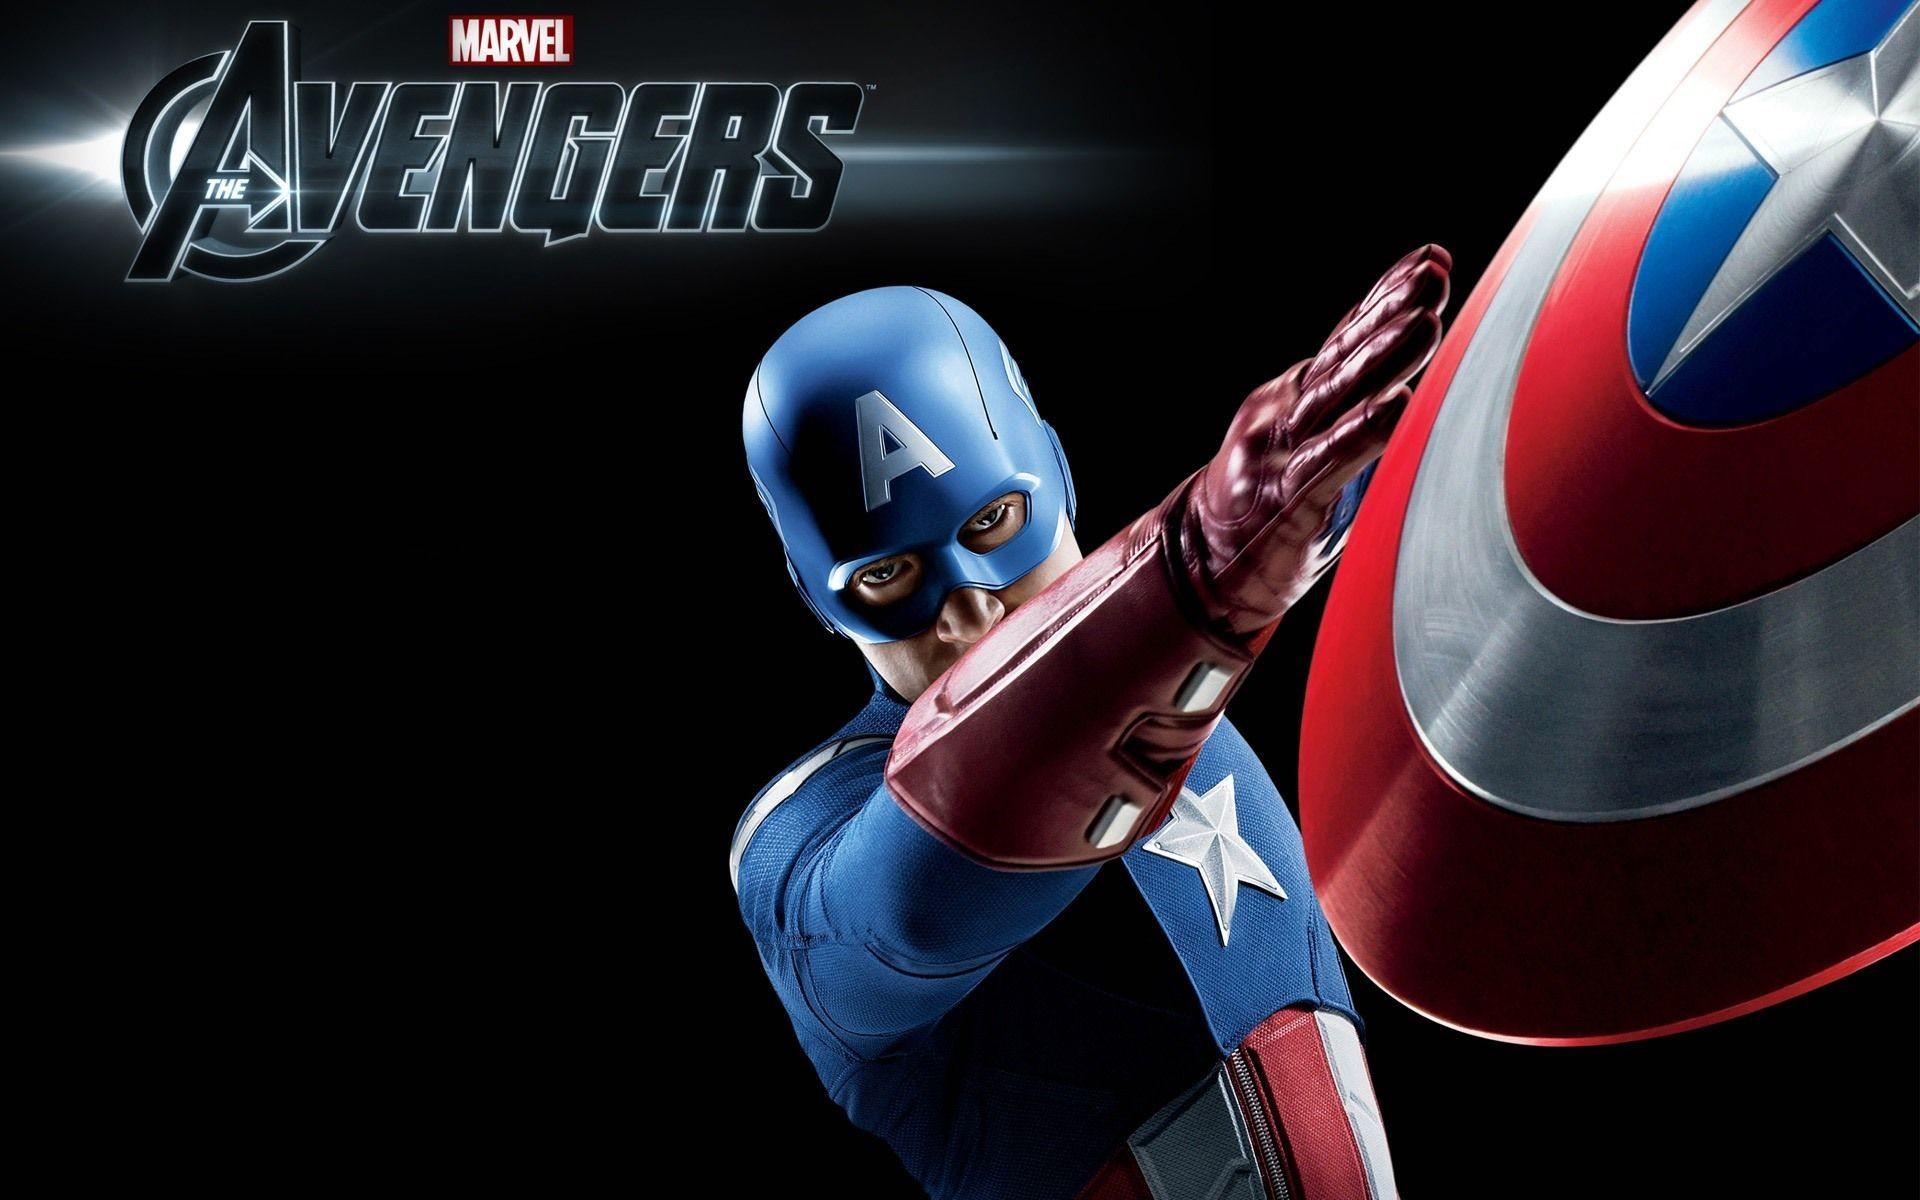 Chris Hemsworth Thor Avengers Wallpapers HD Wallpapers 1920×1200 Avengers  Hd Wallpaper (43 Wallpapers · Avengers WallpaperCaptain America …